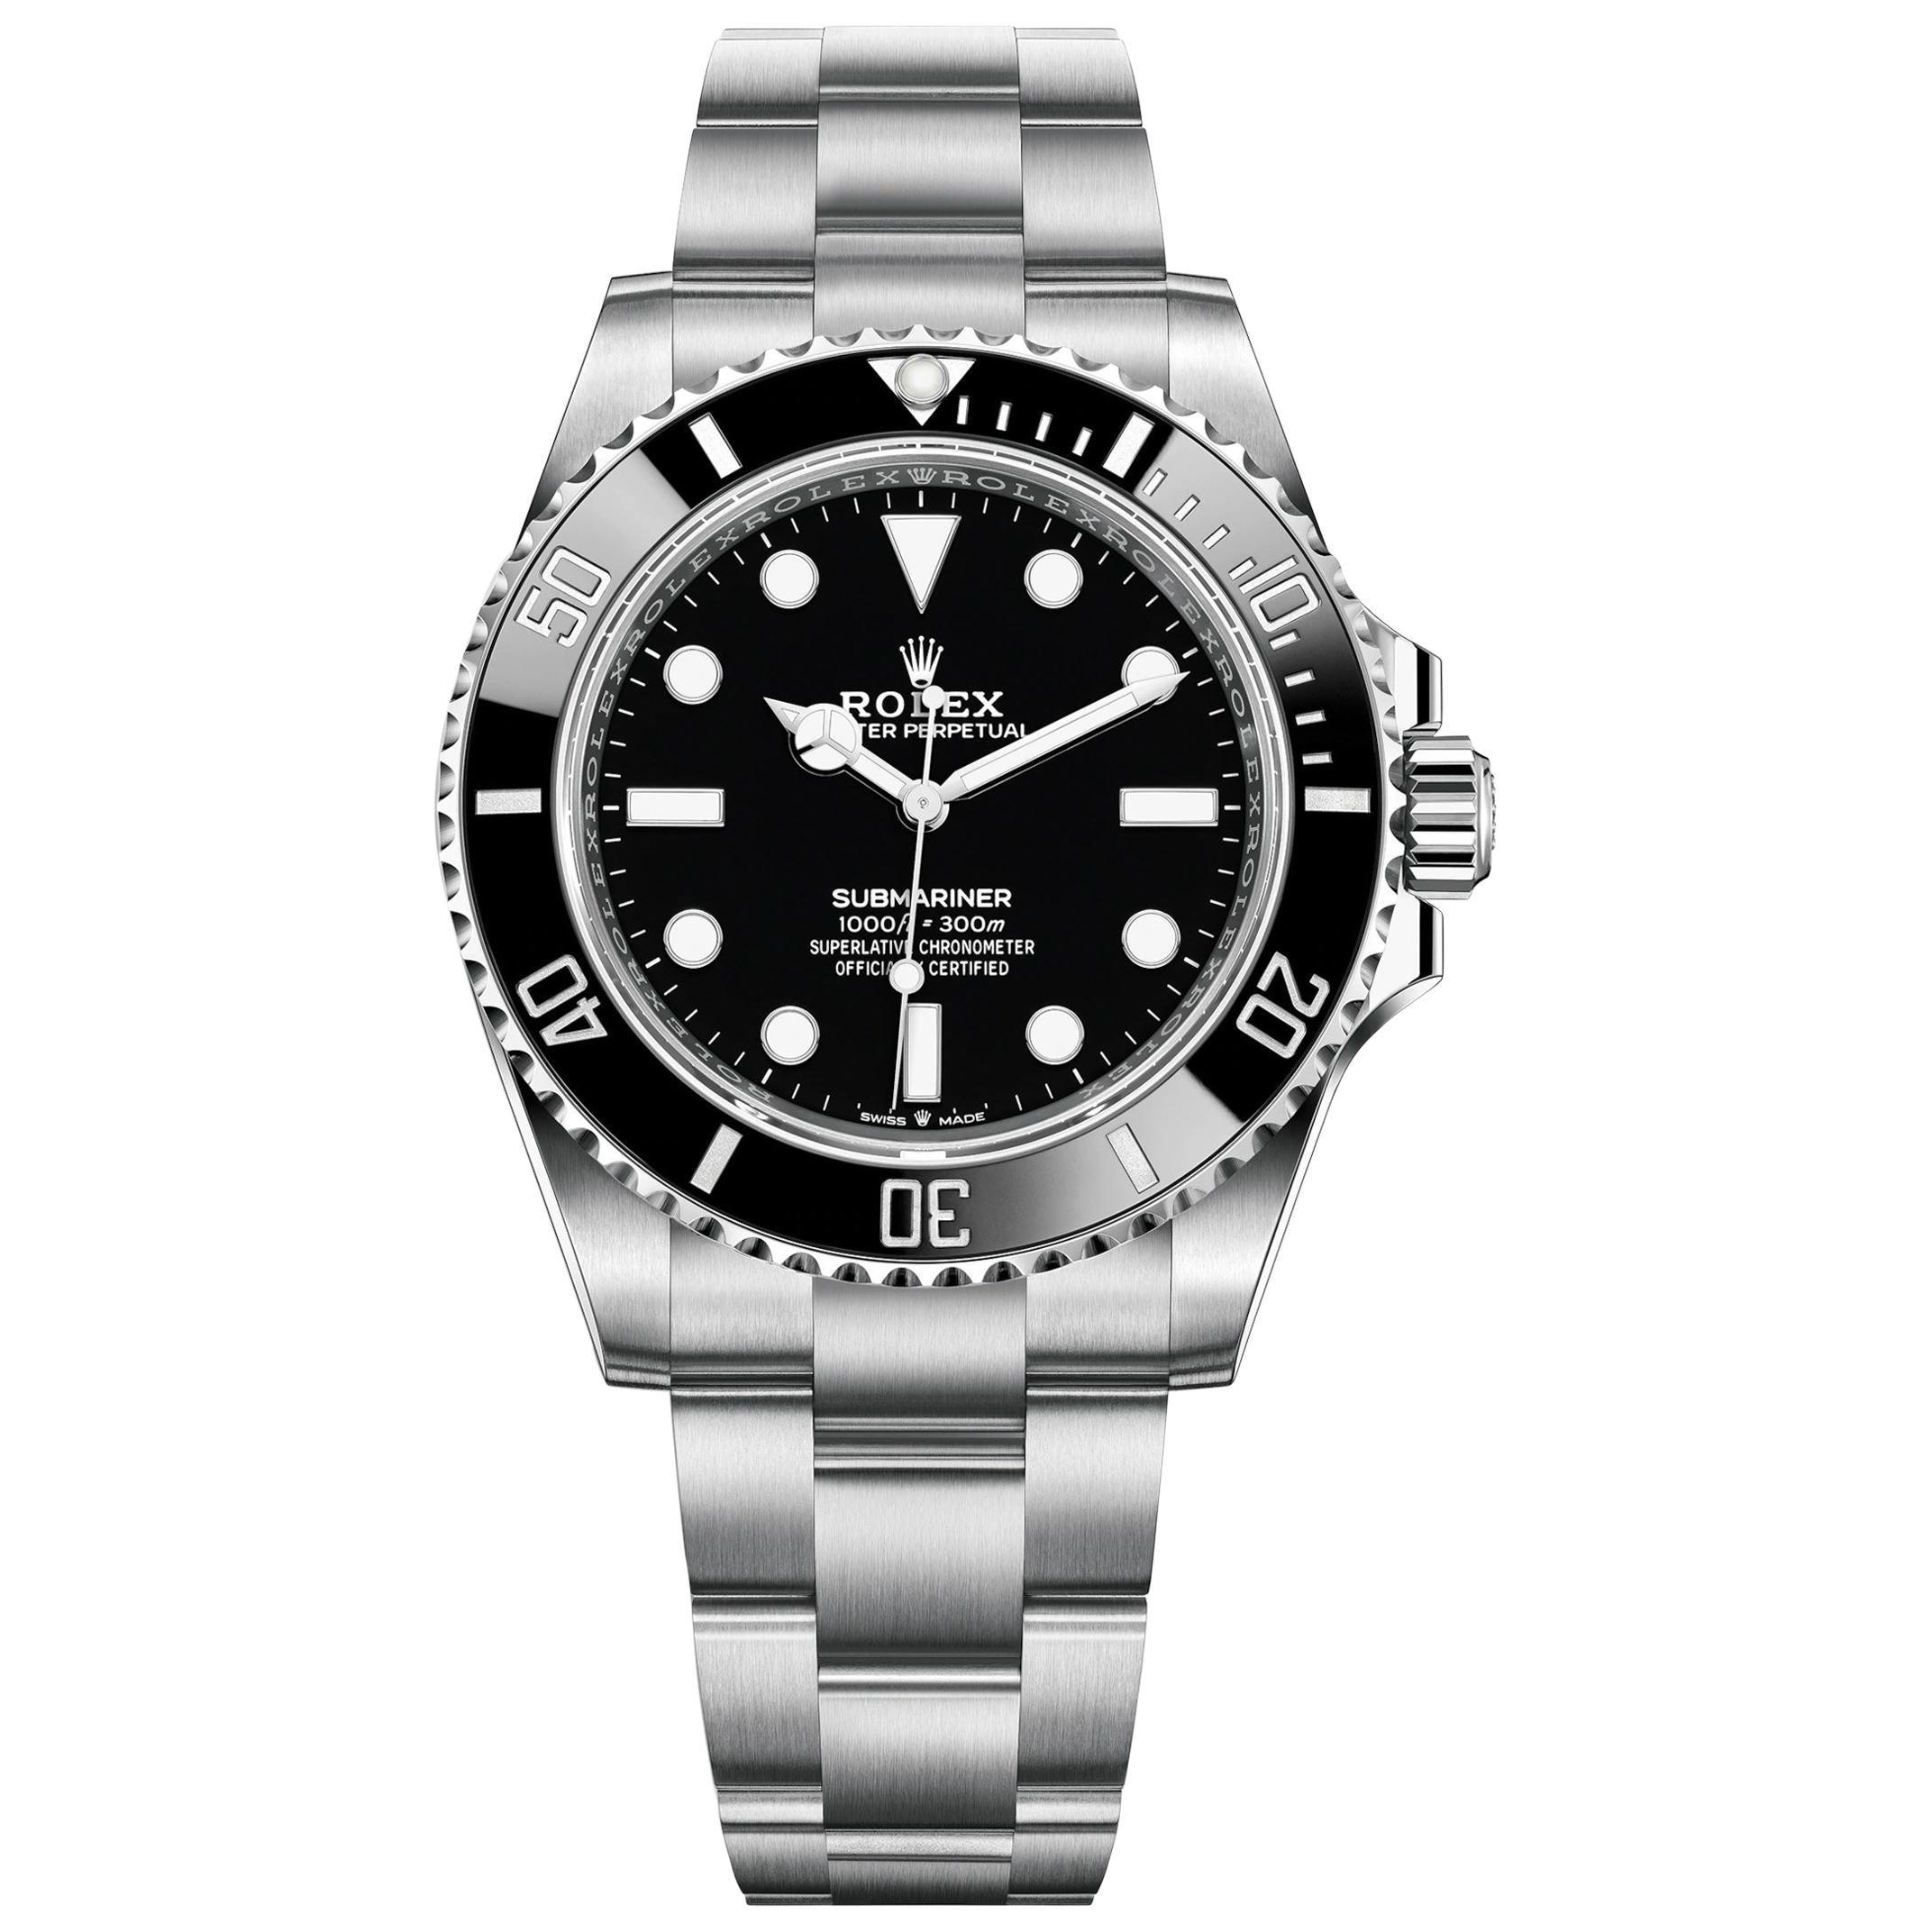 Rolex Submariner Black Dial Men's Diving Watch 124060-0001